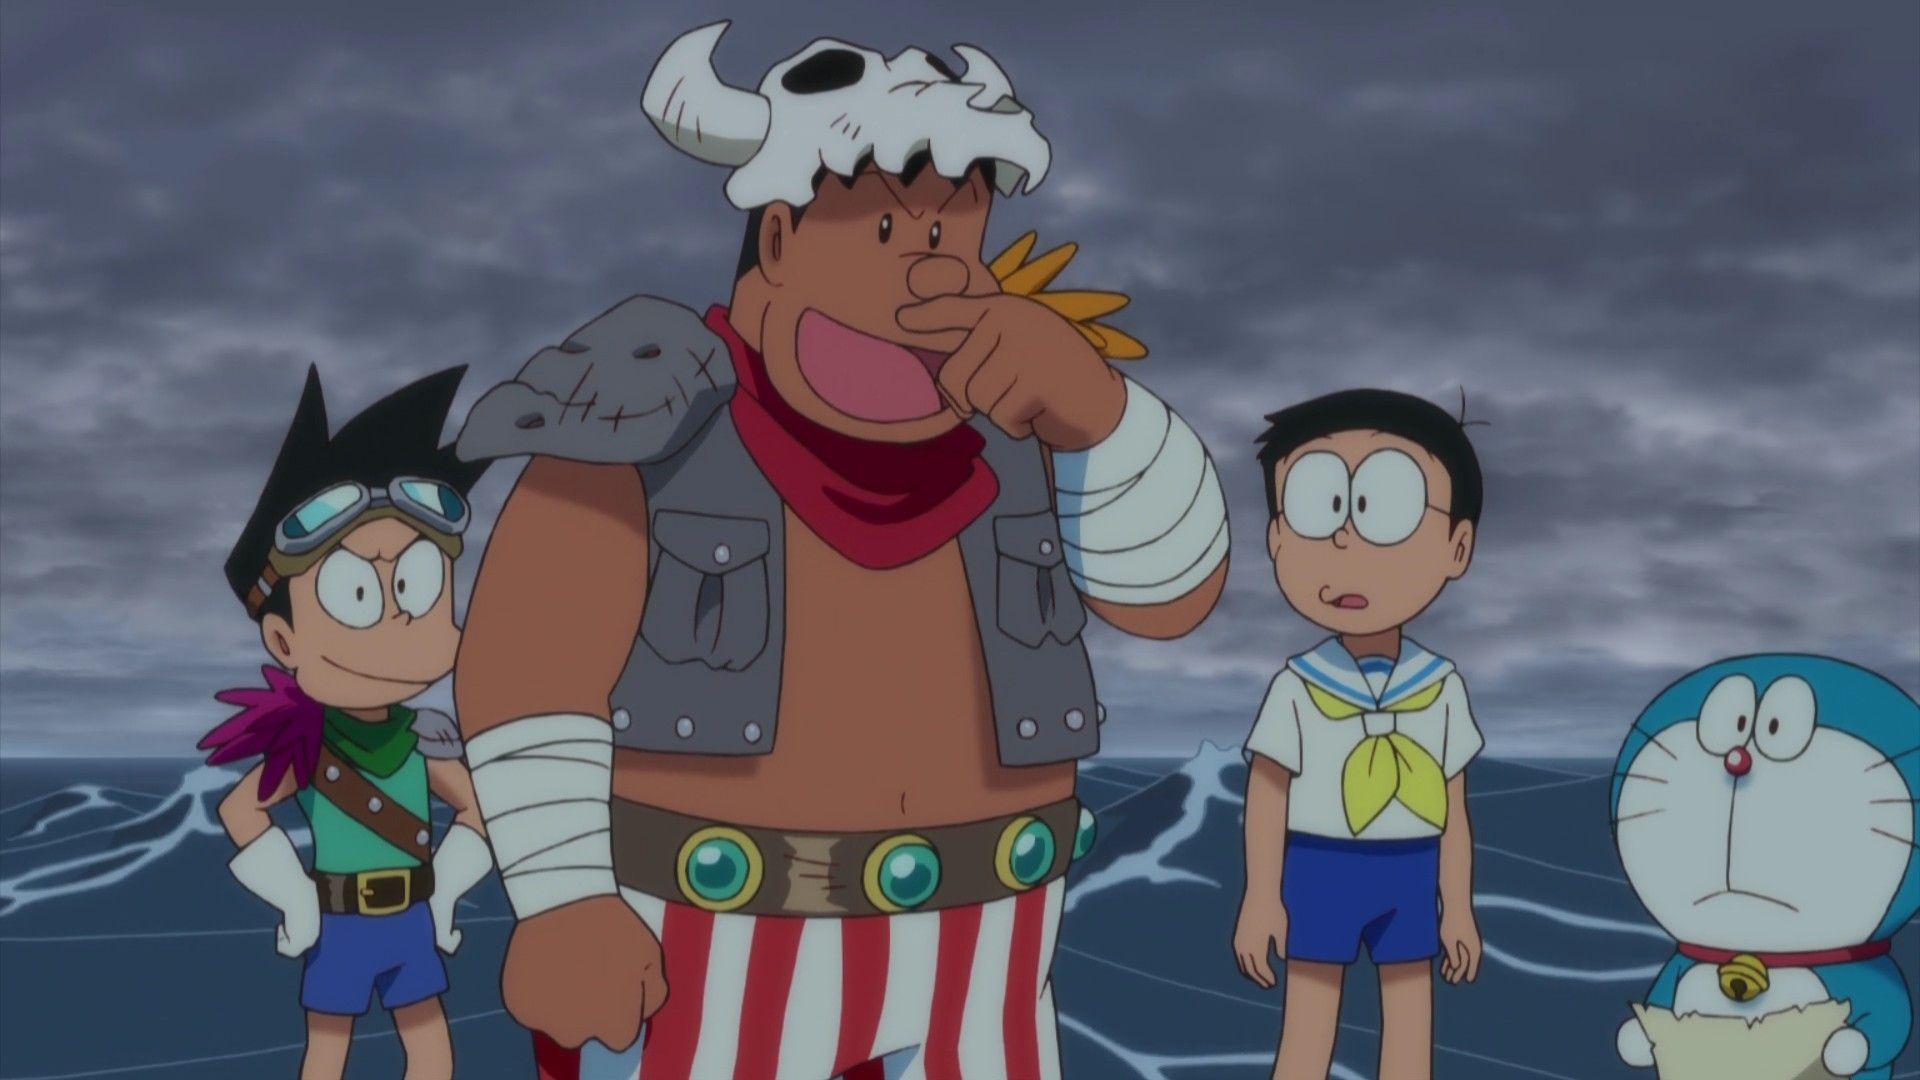 Pin on Doraemon anime [ Fantasy anime ]